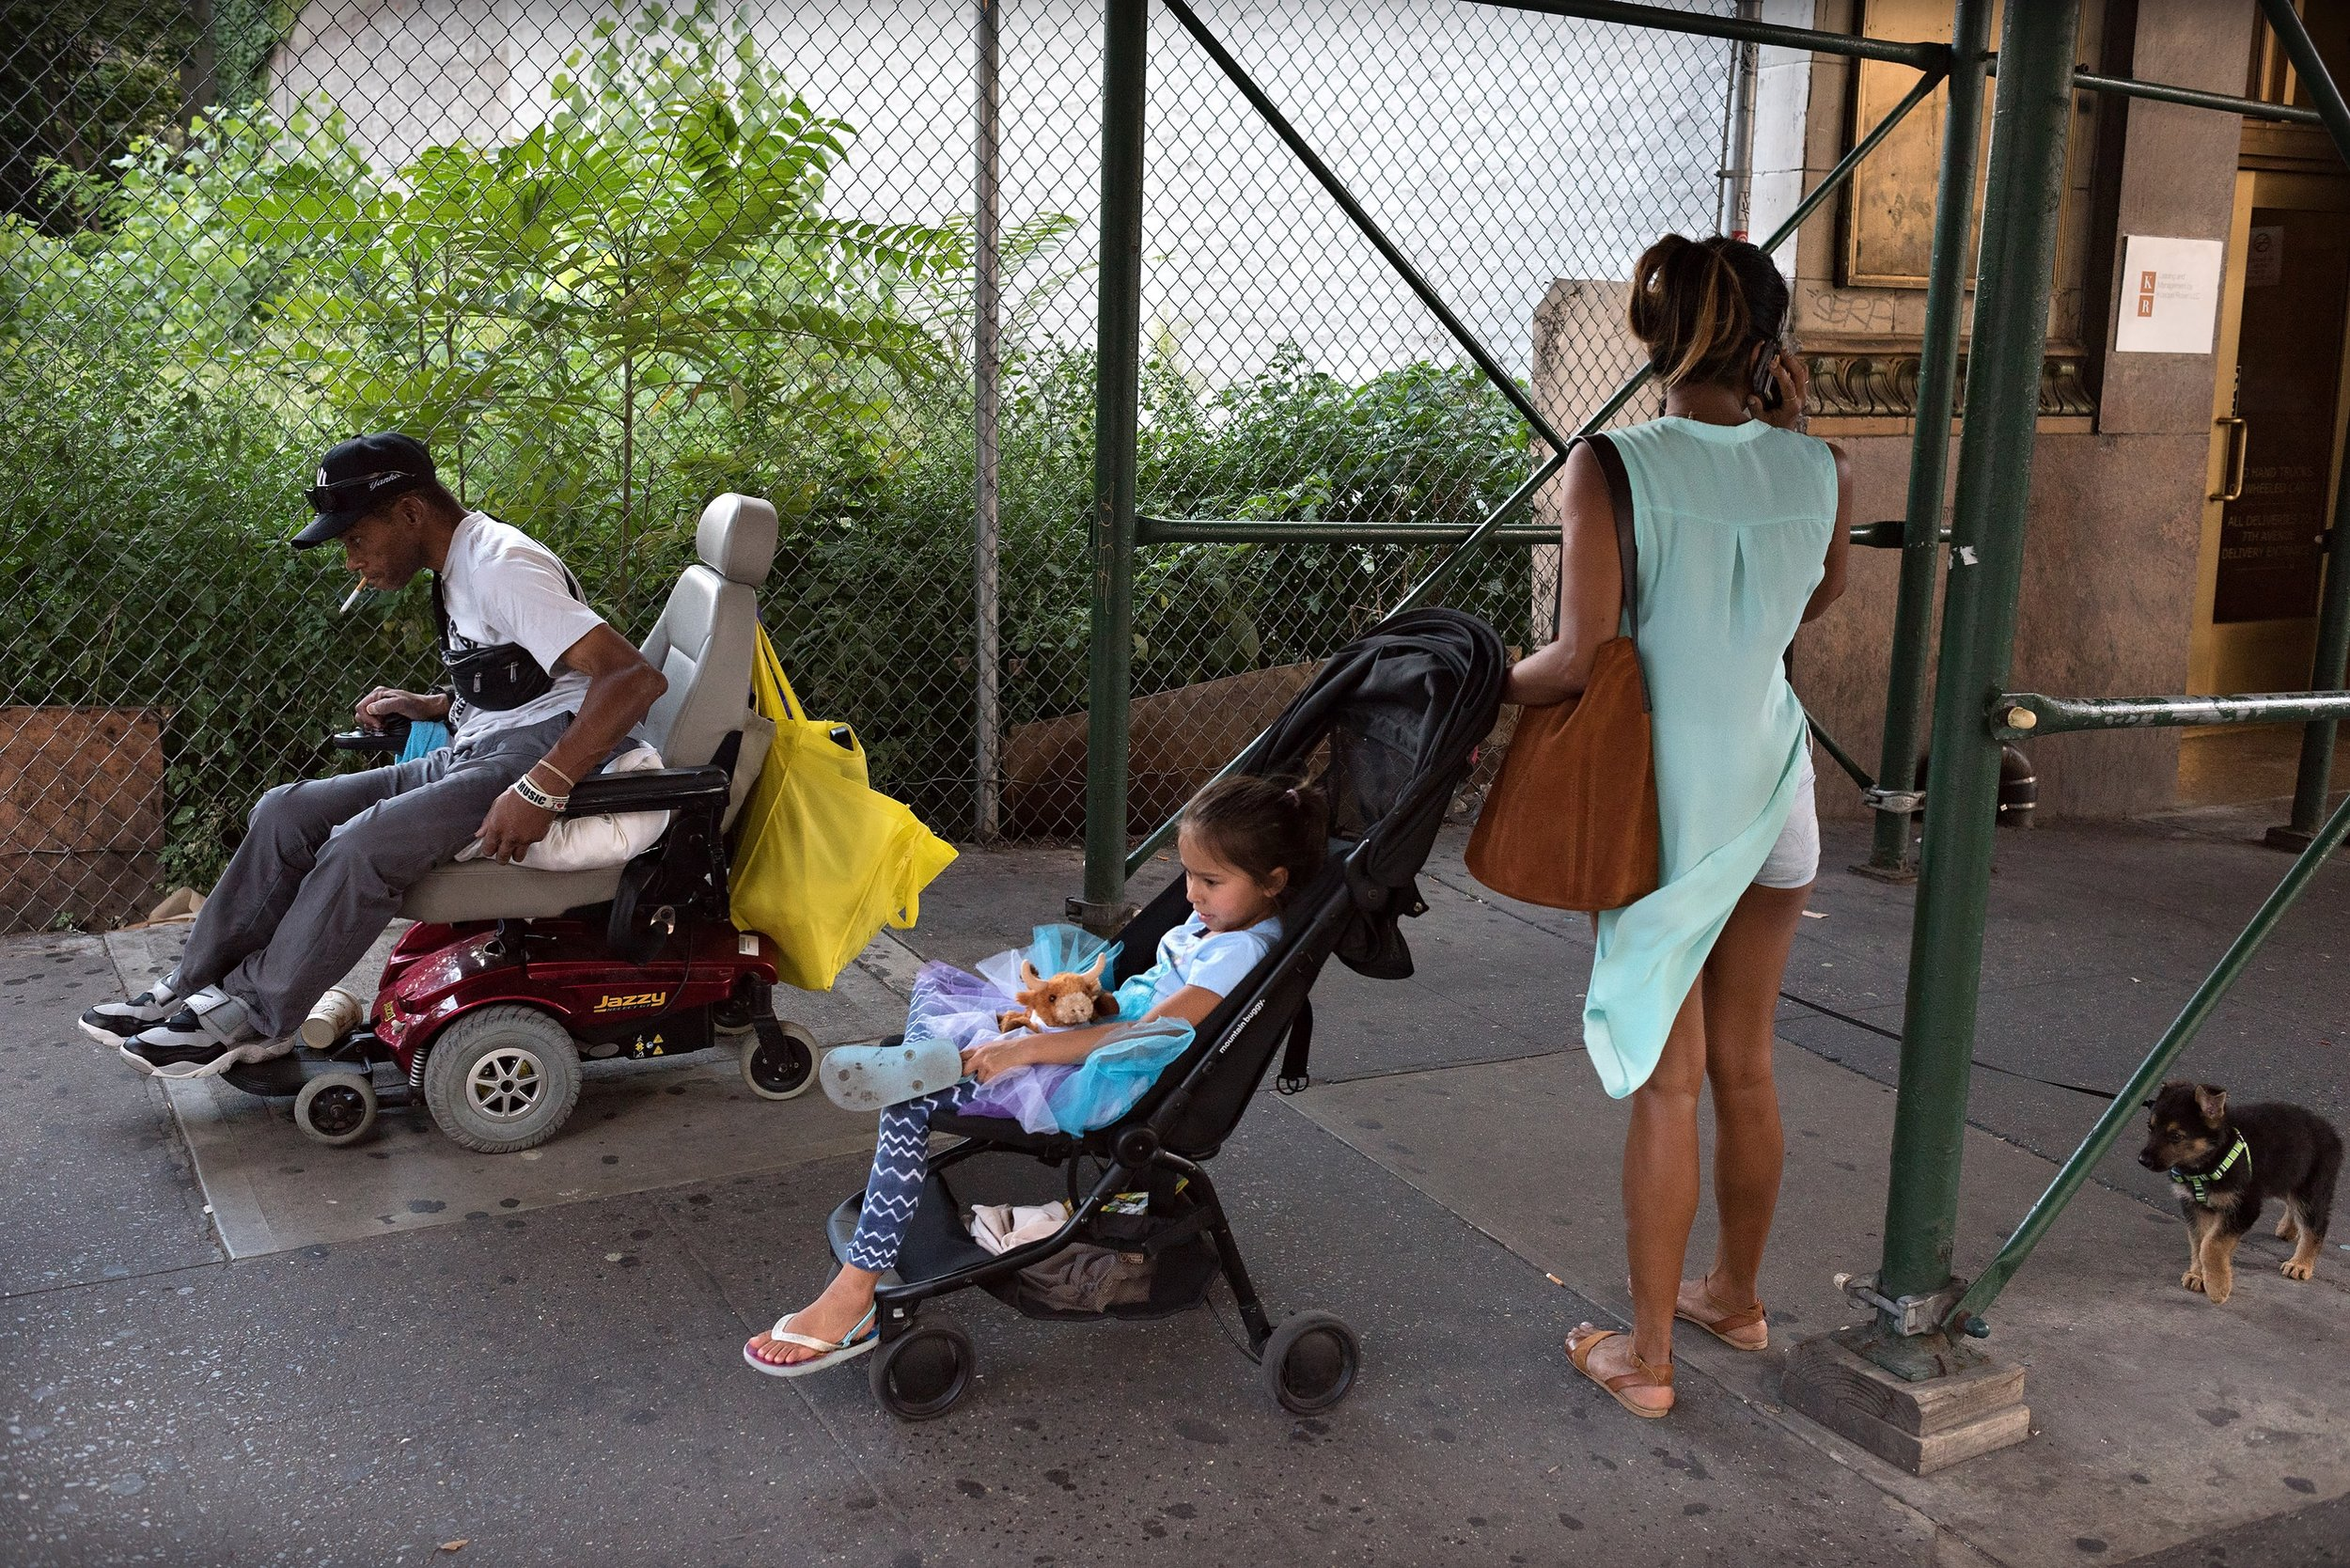 new-york-city-street-photography-collective-frank-multari-5